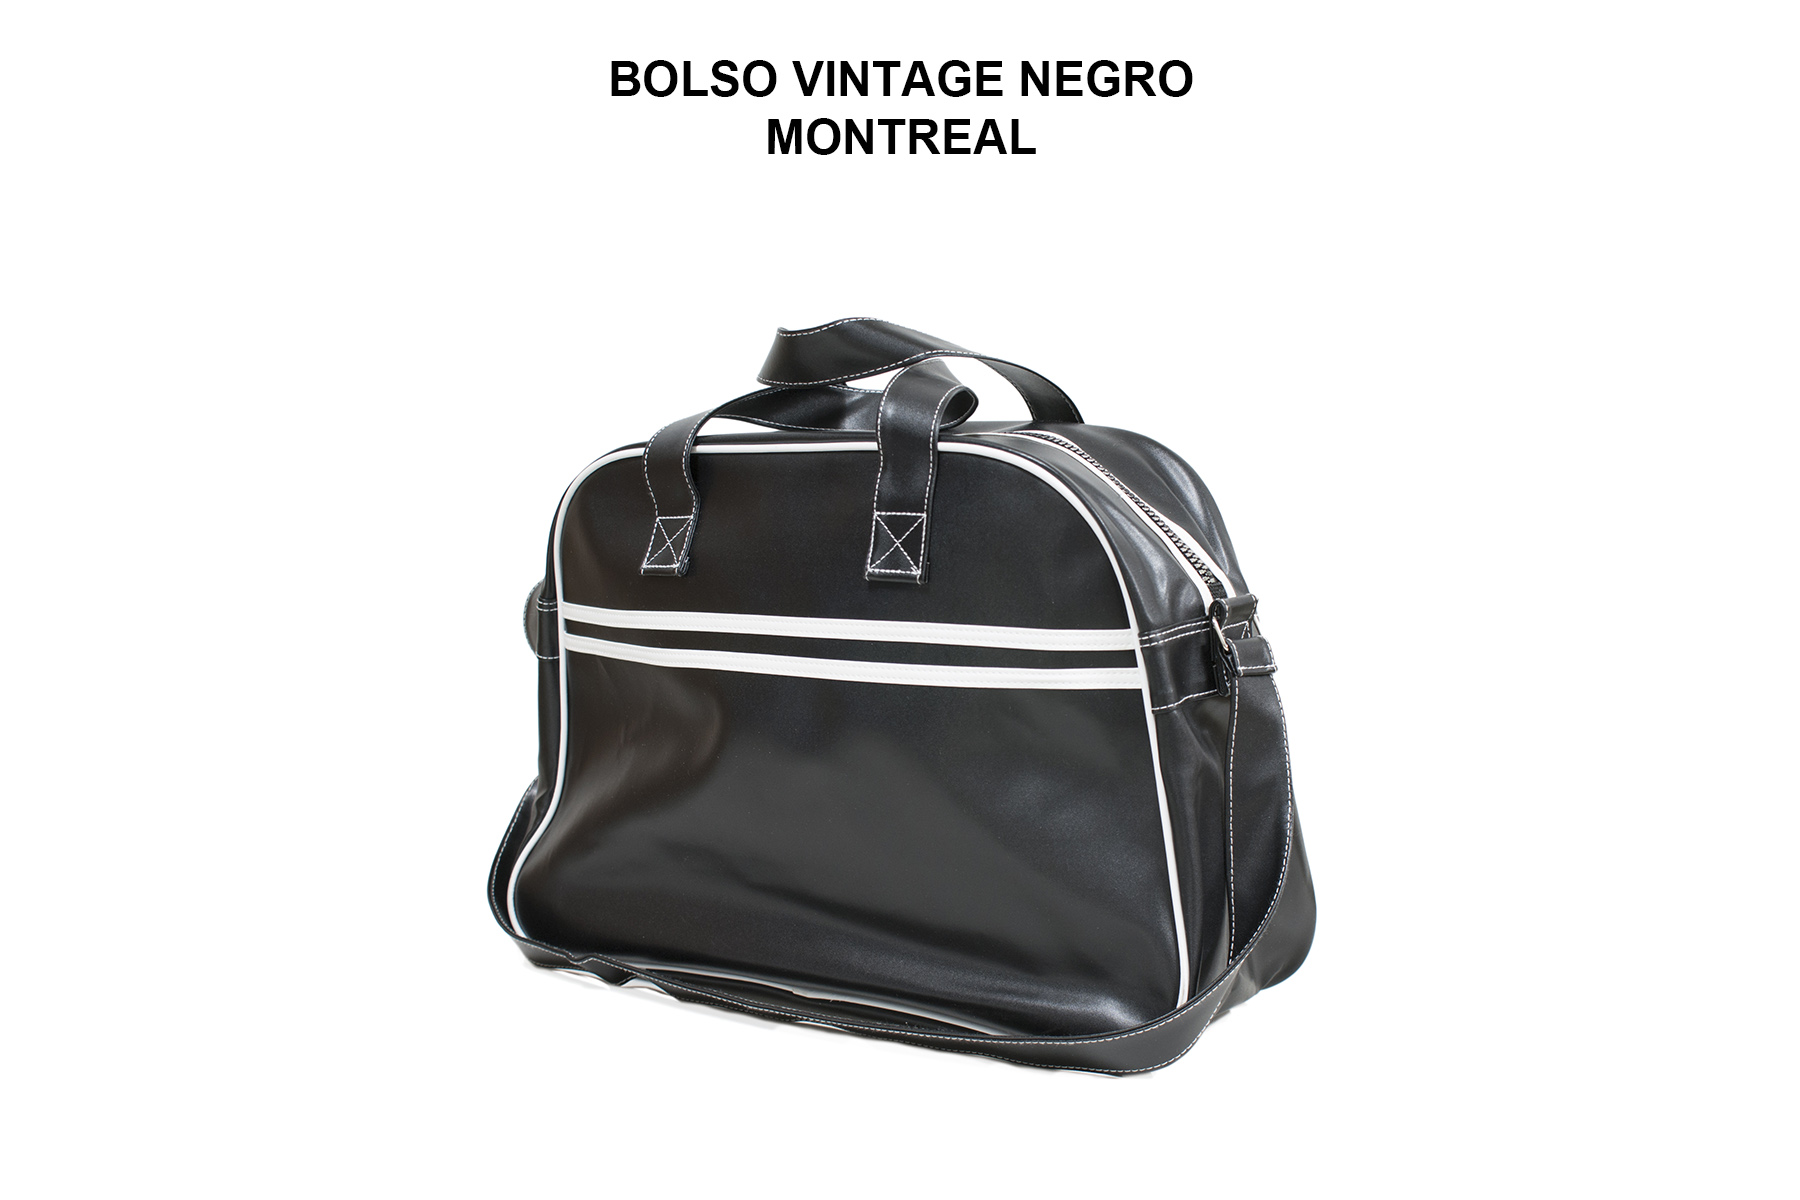 BOLSO VINTAGE NEGRO MONTREAL